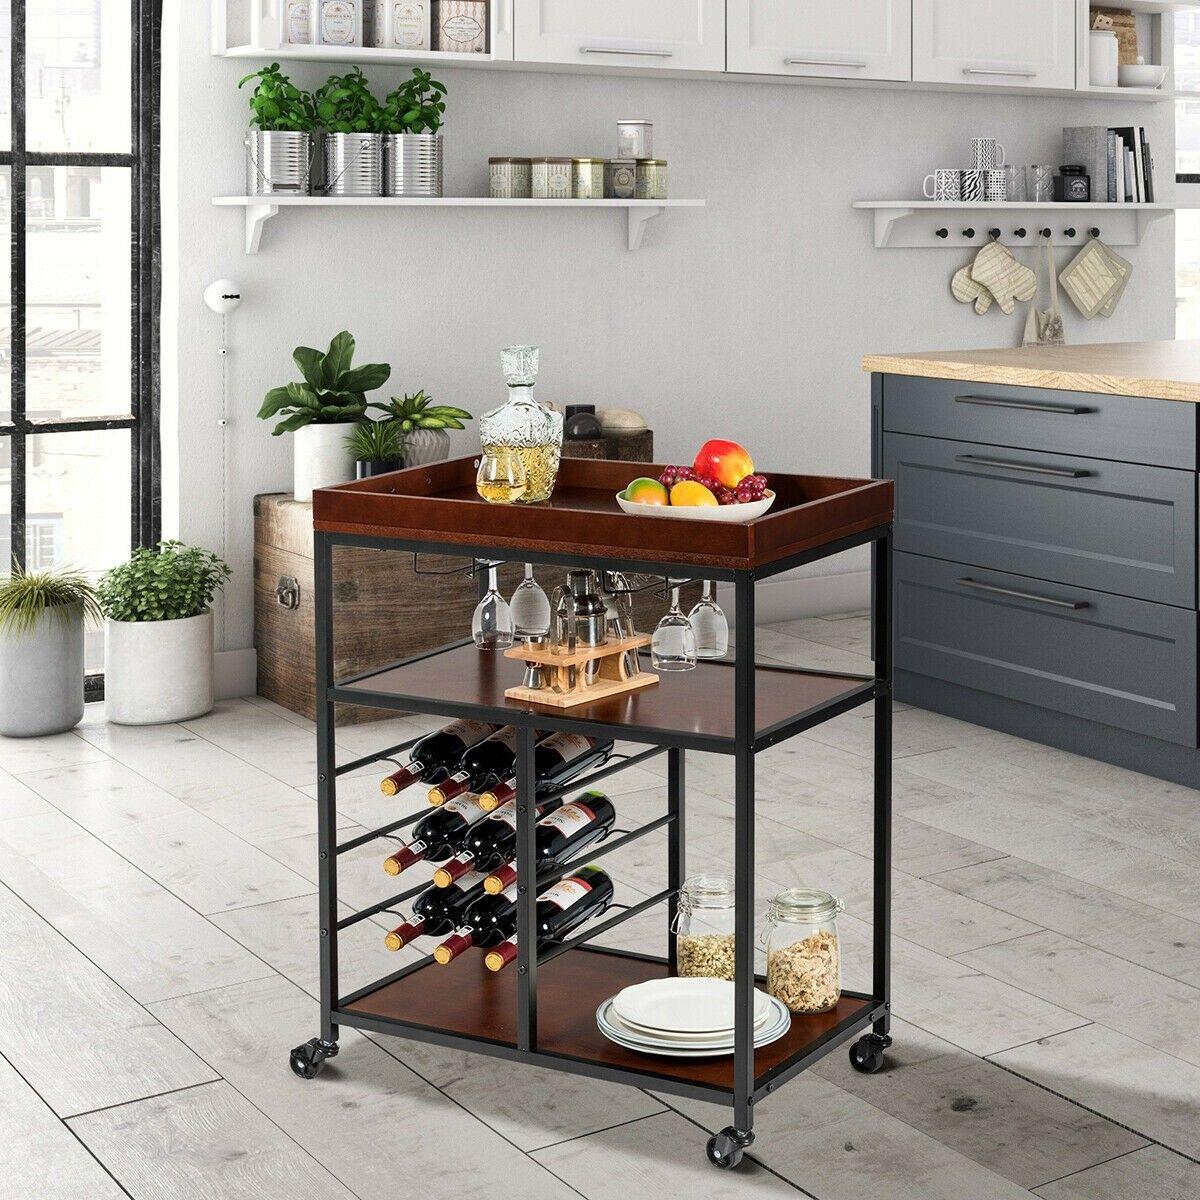 Pin On Shelf Display Kitchen cart with wine rack